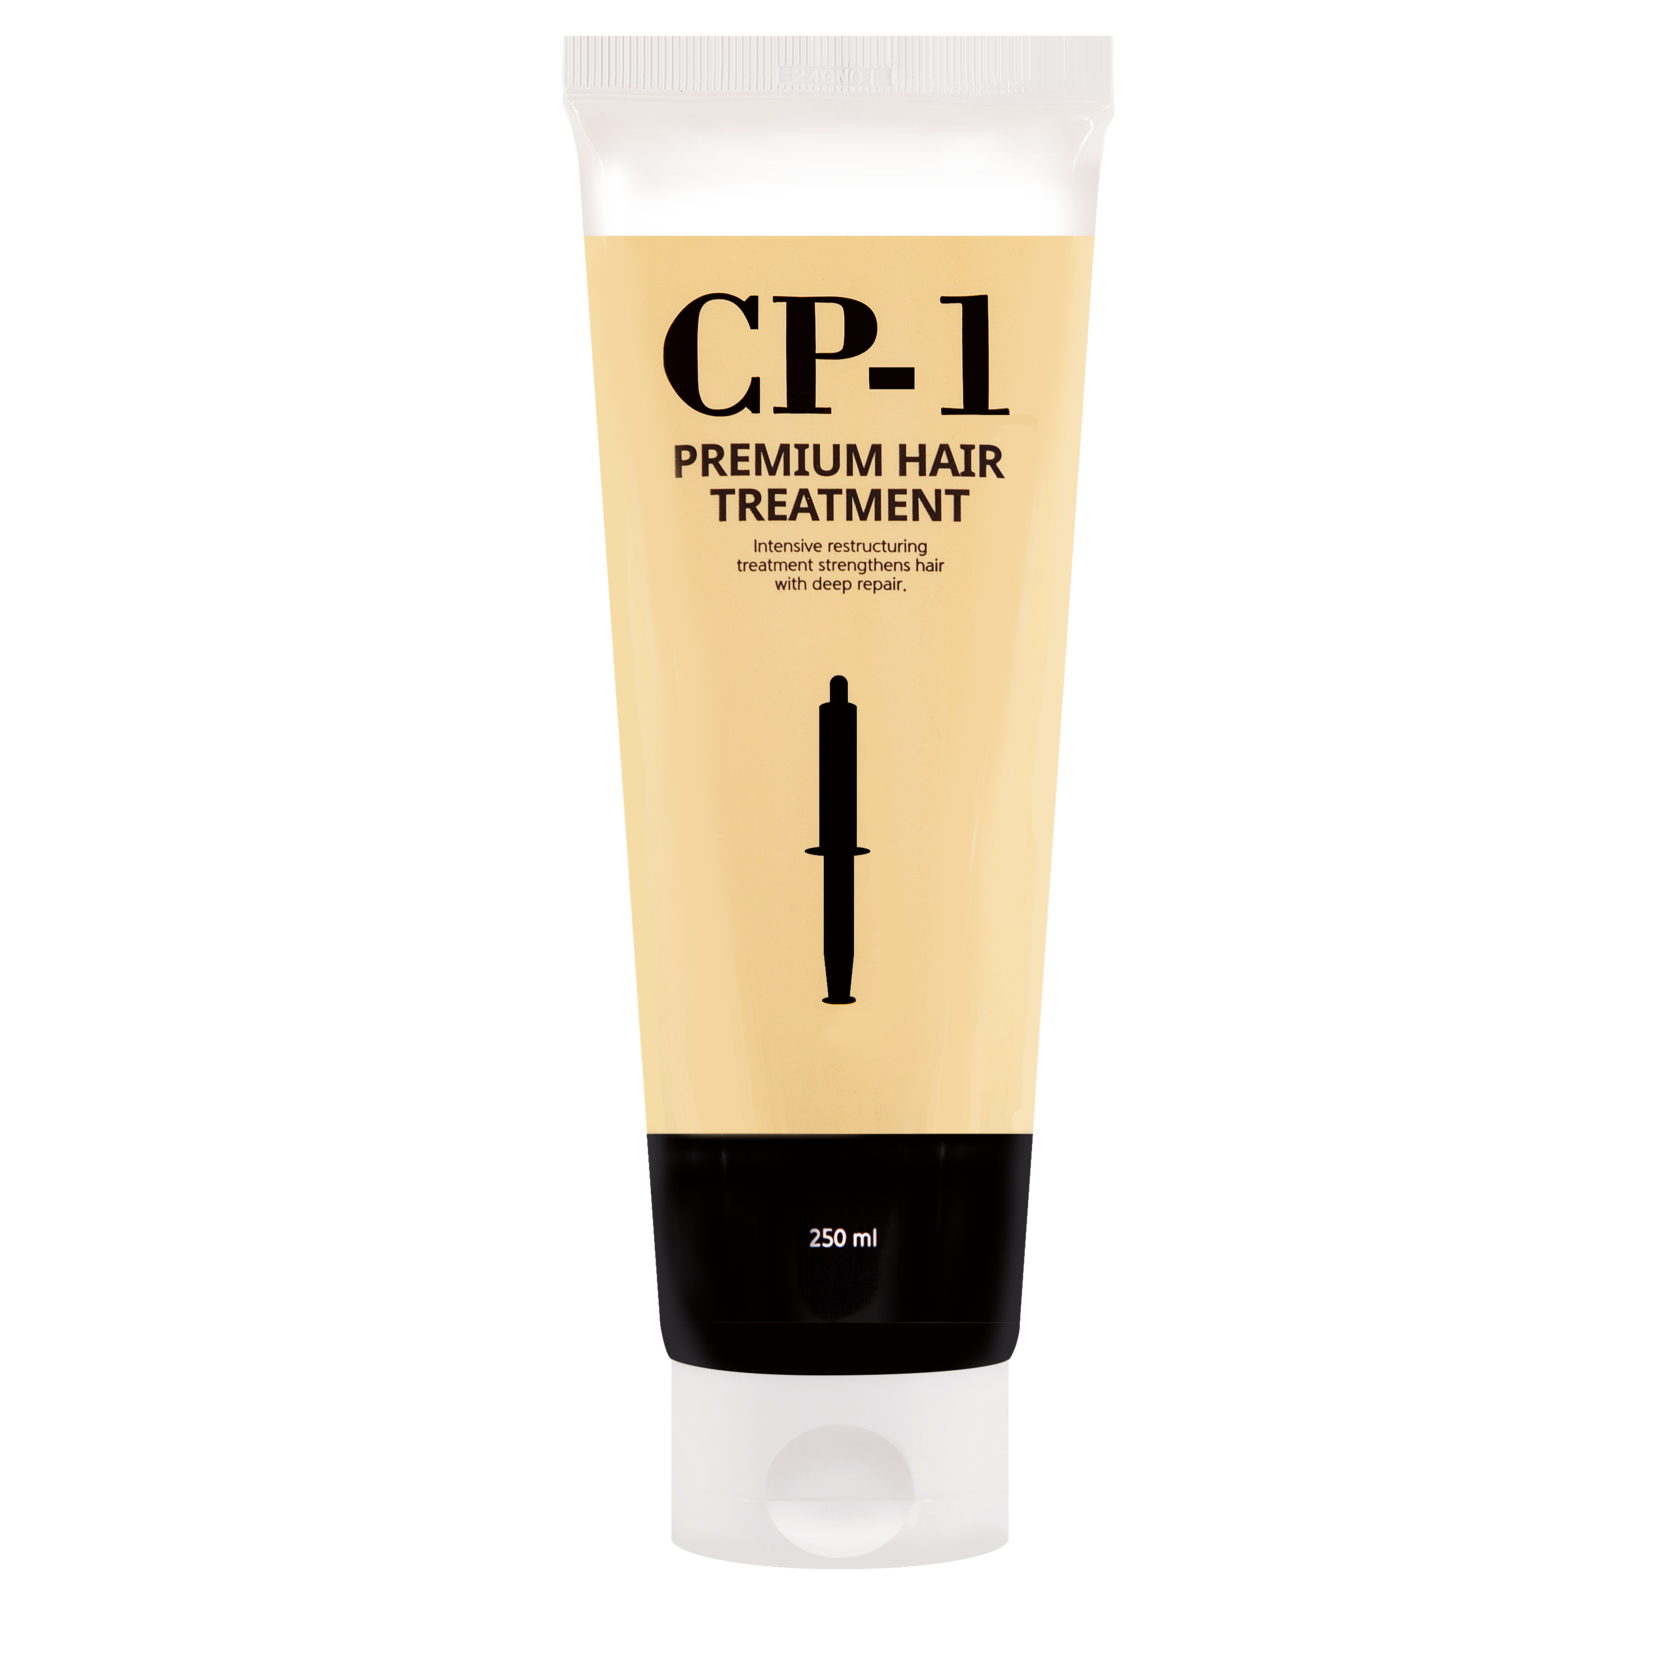 ESTHETIC HOUSE Протеиновая маска для волос CP-1 Premium Protein Treatment, 250 мл